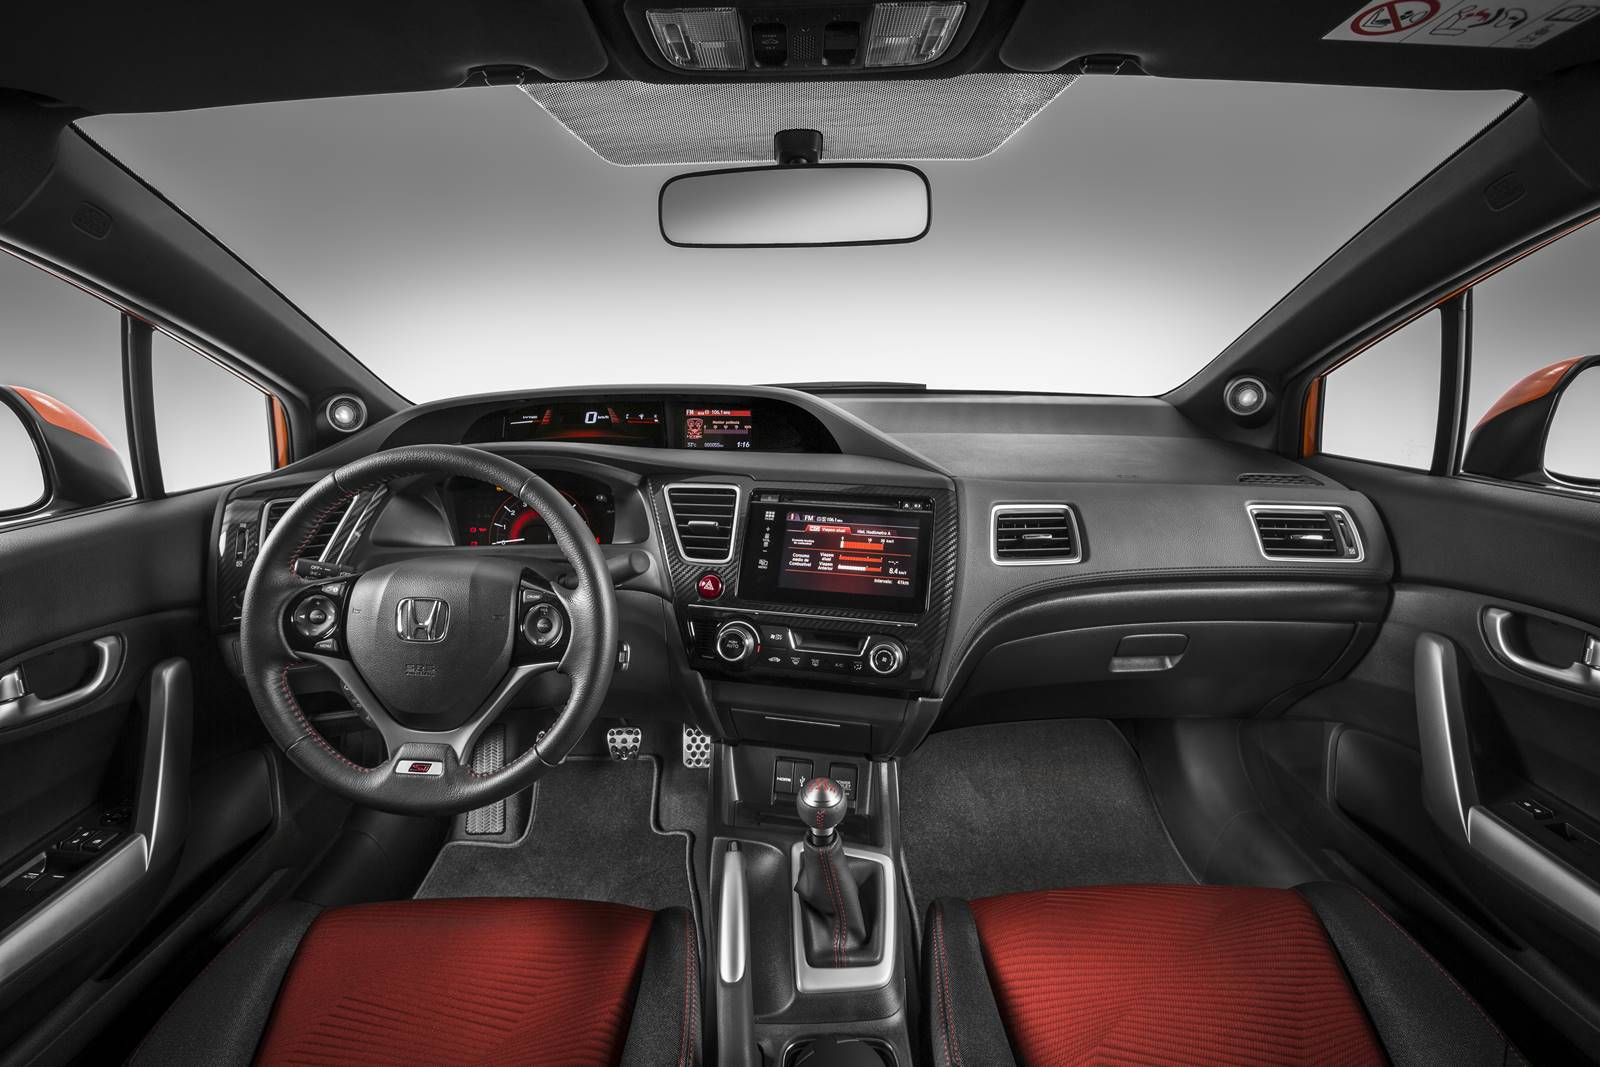 Honda civic si 2015 pre o itens de s rie e especifica es car blog br for 2014 honda civic si sedan interior